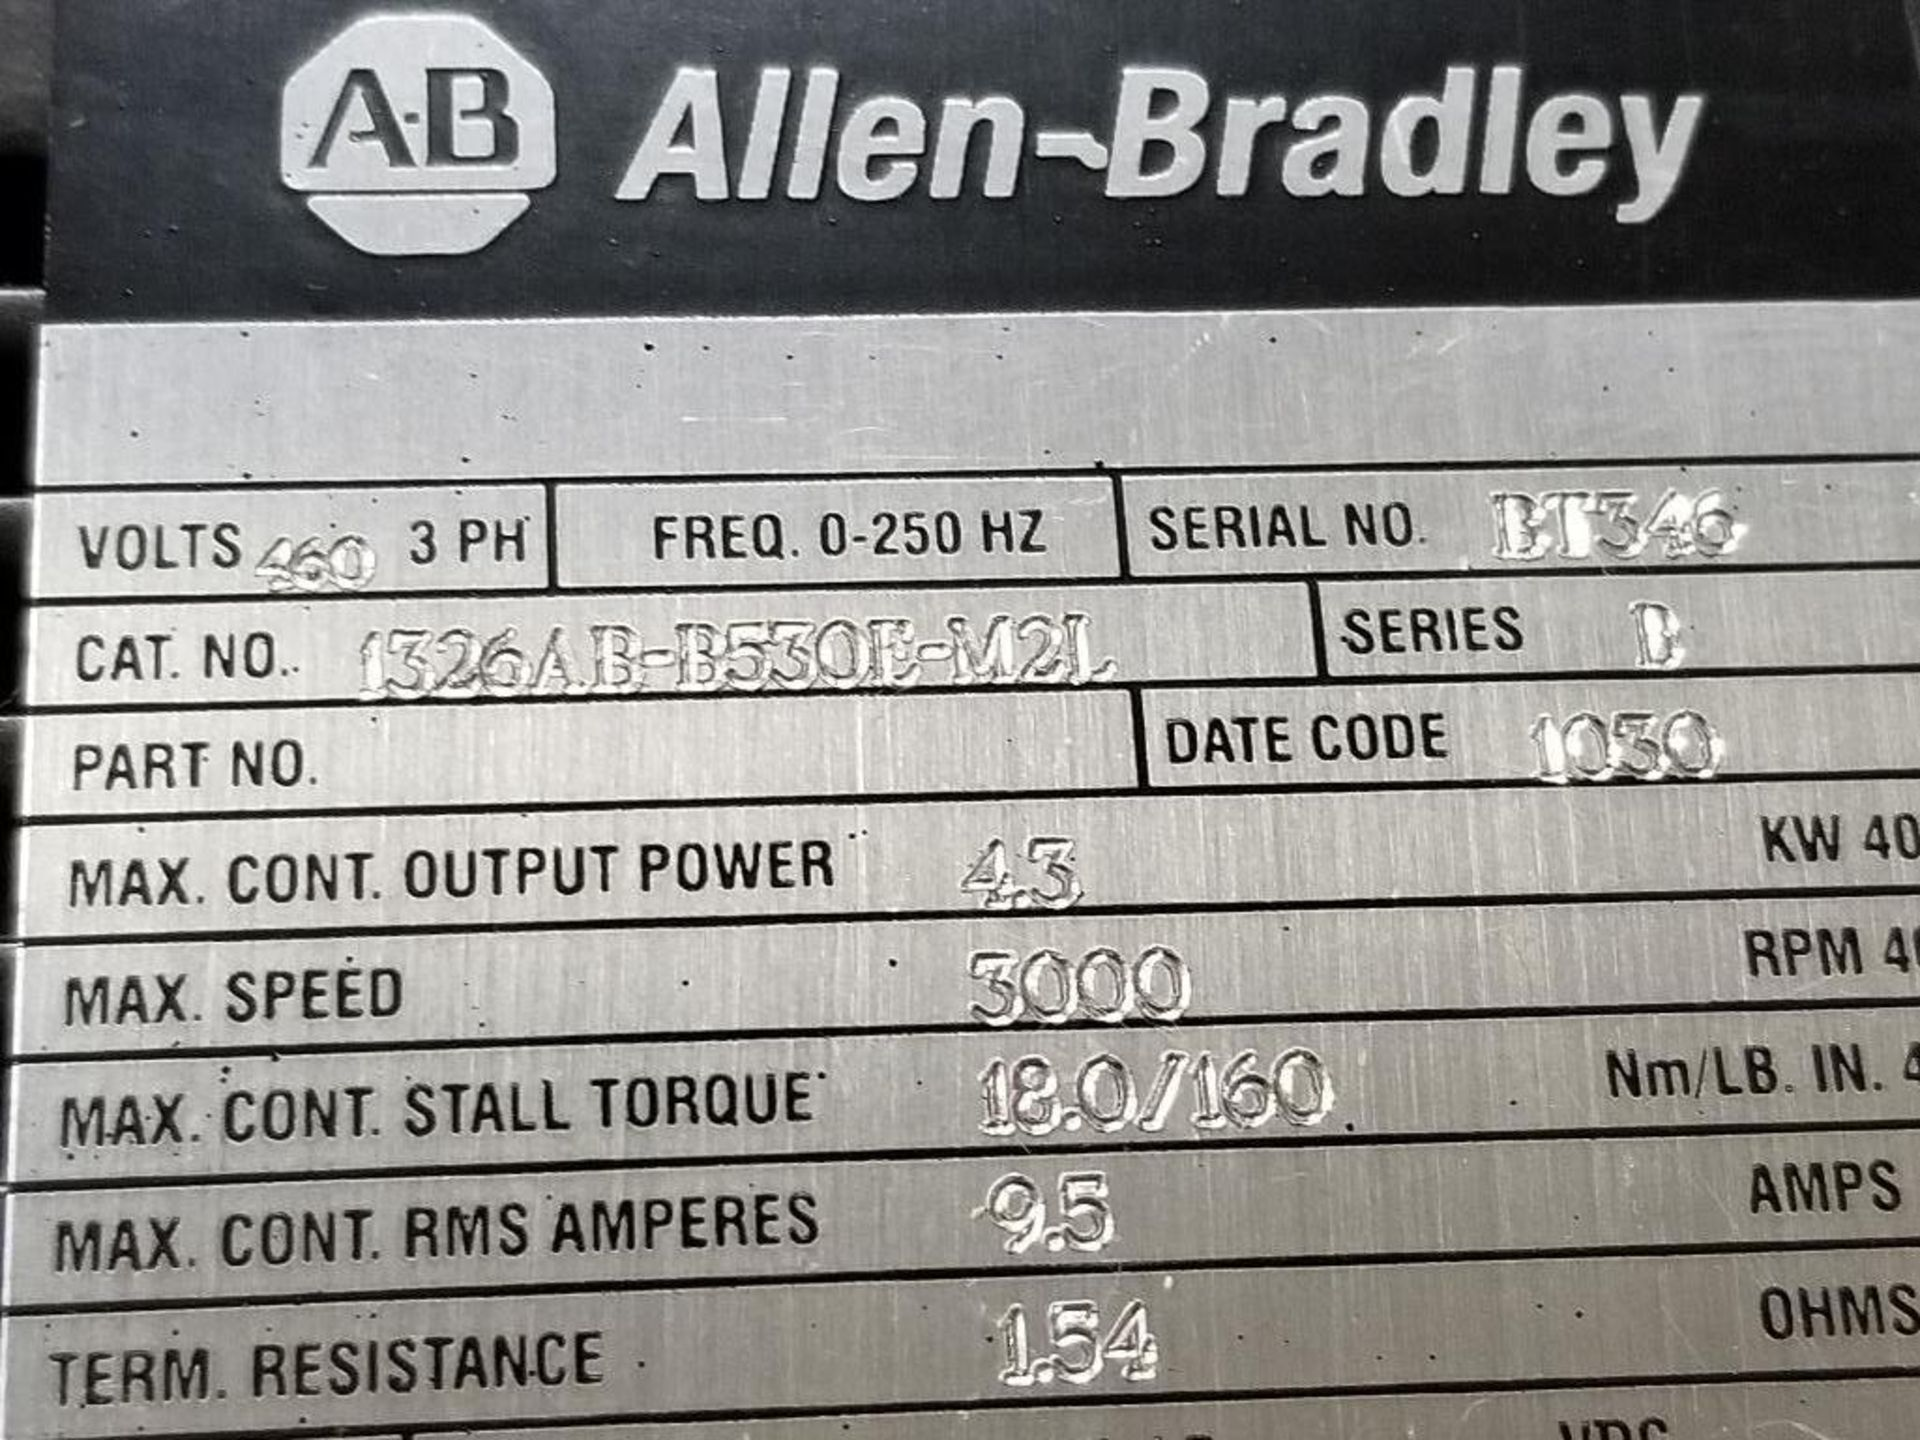 4.3kW Allen Bradley servo motor. 1326AB-B530E-M2L. 3PH, 460V, 3000RPM. - Image 2 of 4